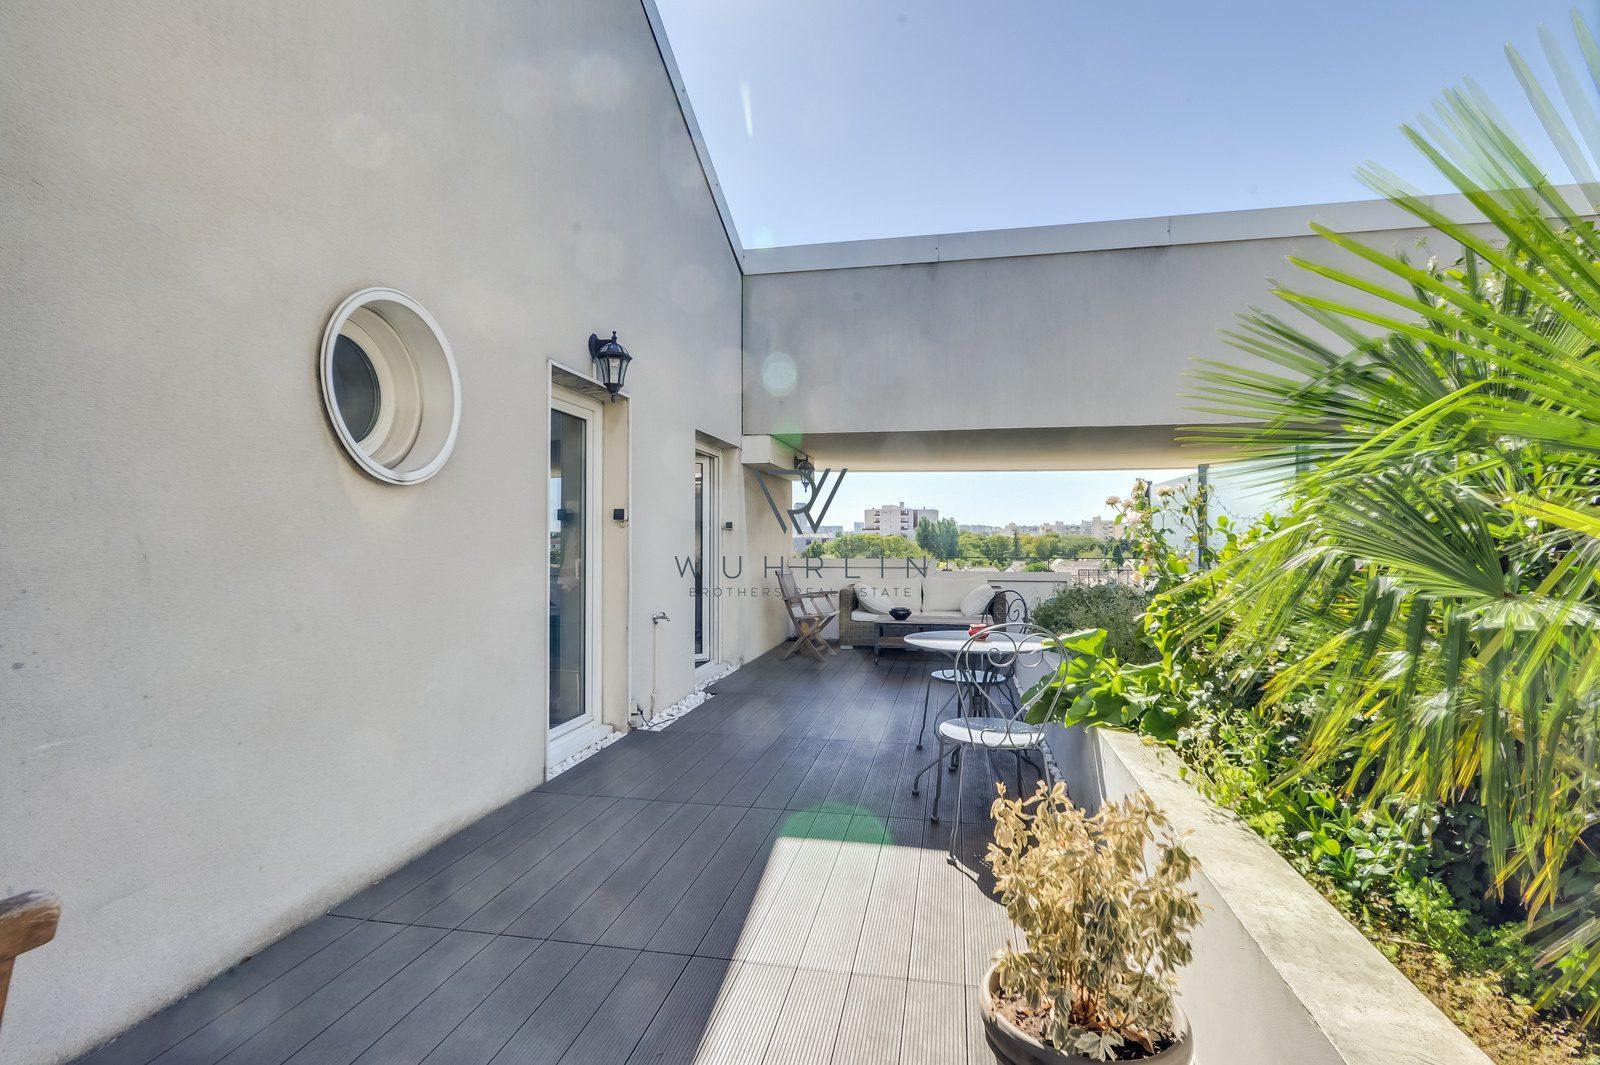 79m2 avec terrasse 40m2 rue Pierre de Ronsard Deuil-la-Barre